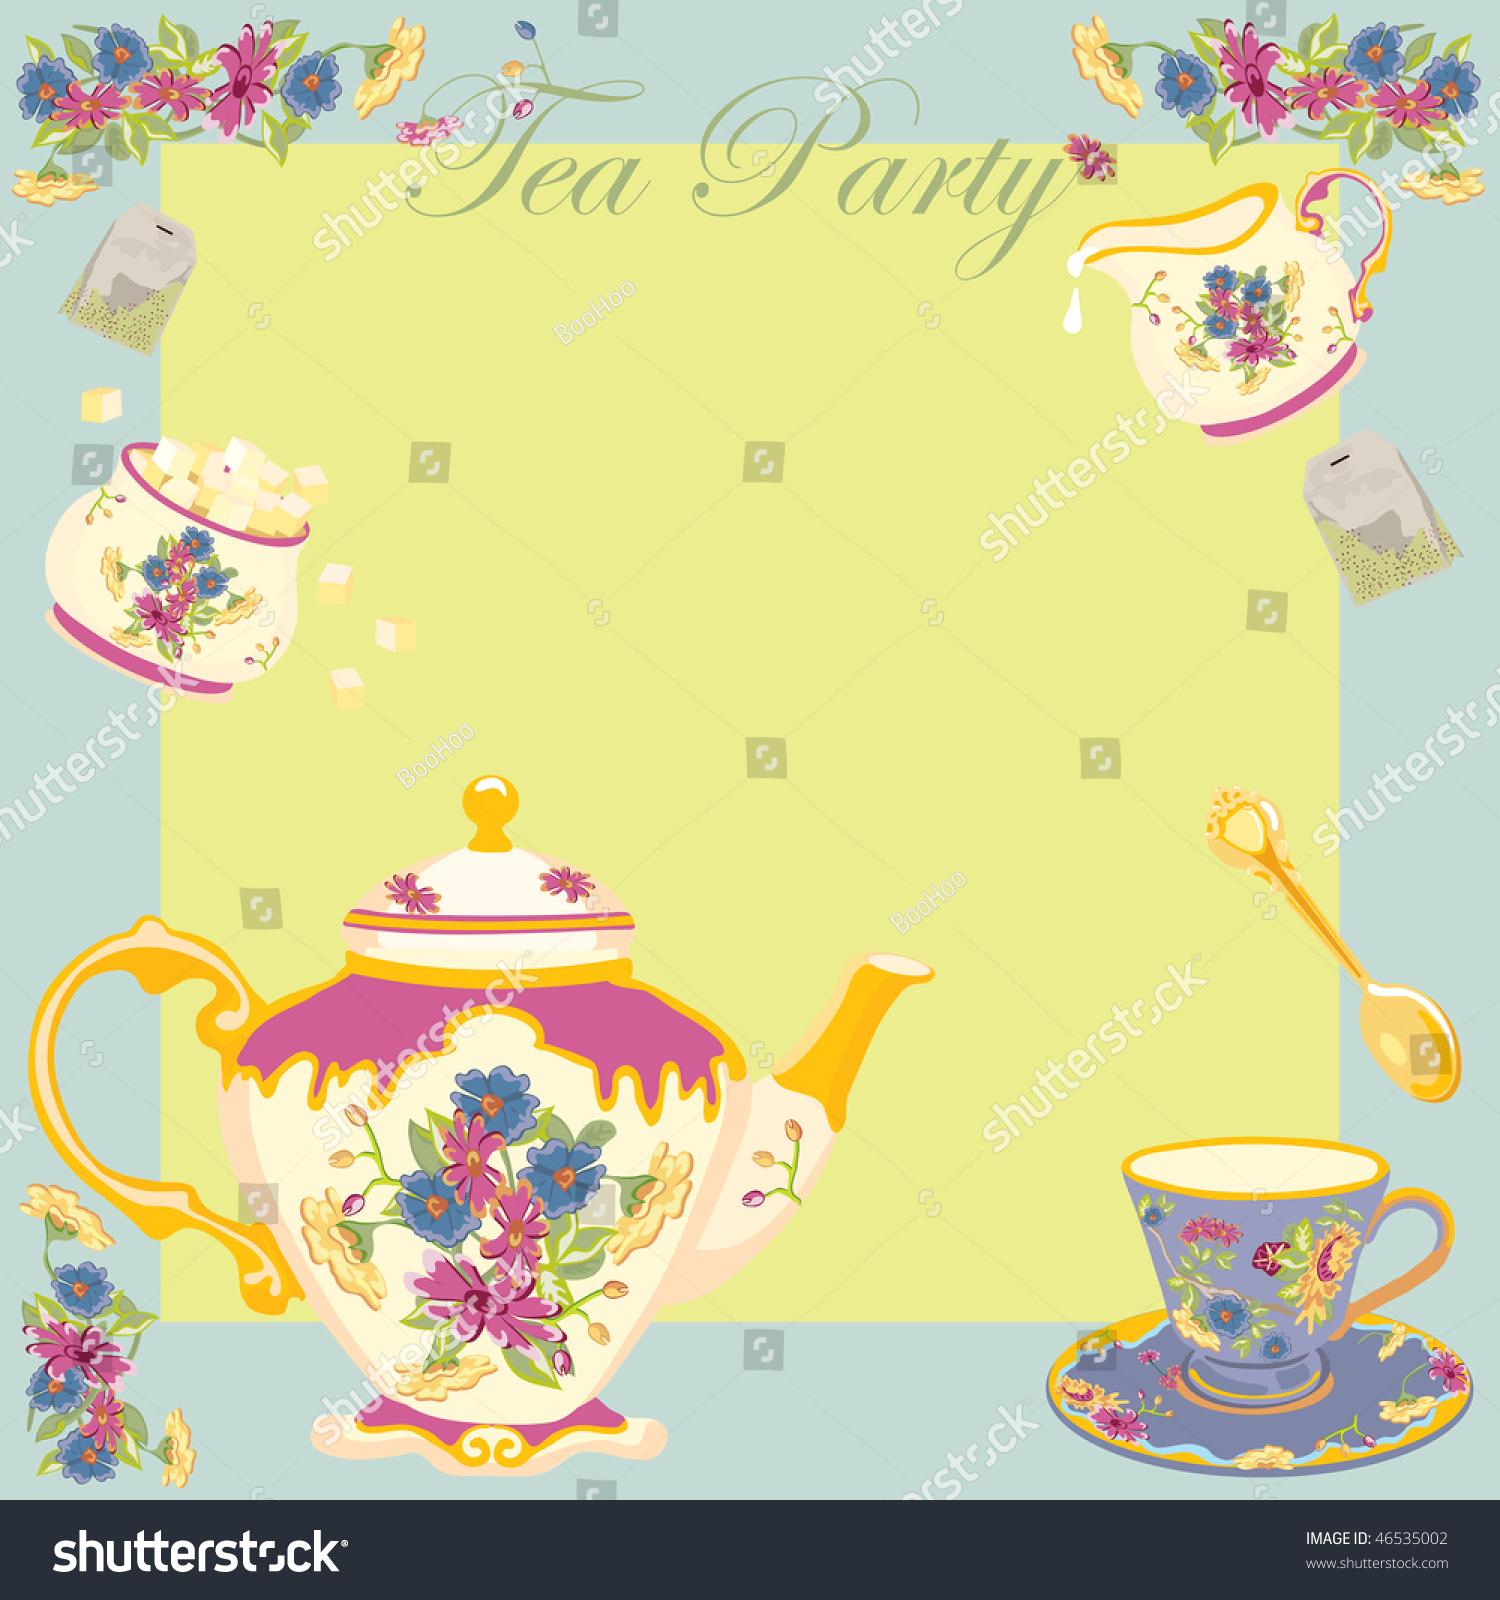 Tea Party Garden Party Invitation Stock Vector 46535002 - Shutterstock